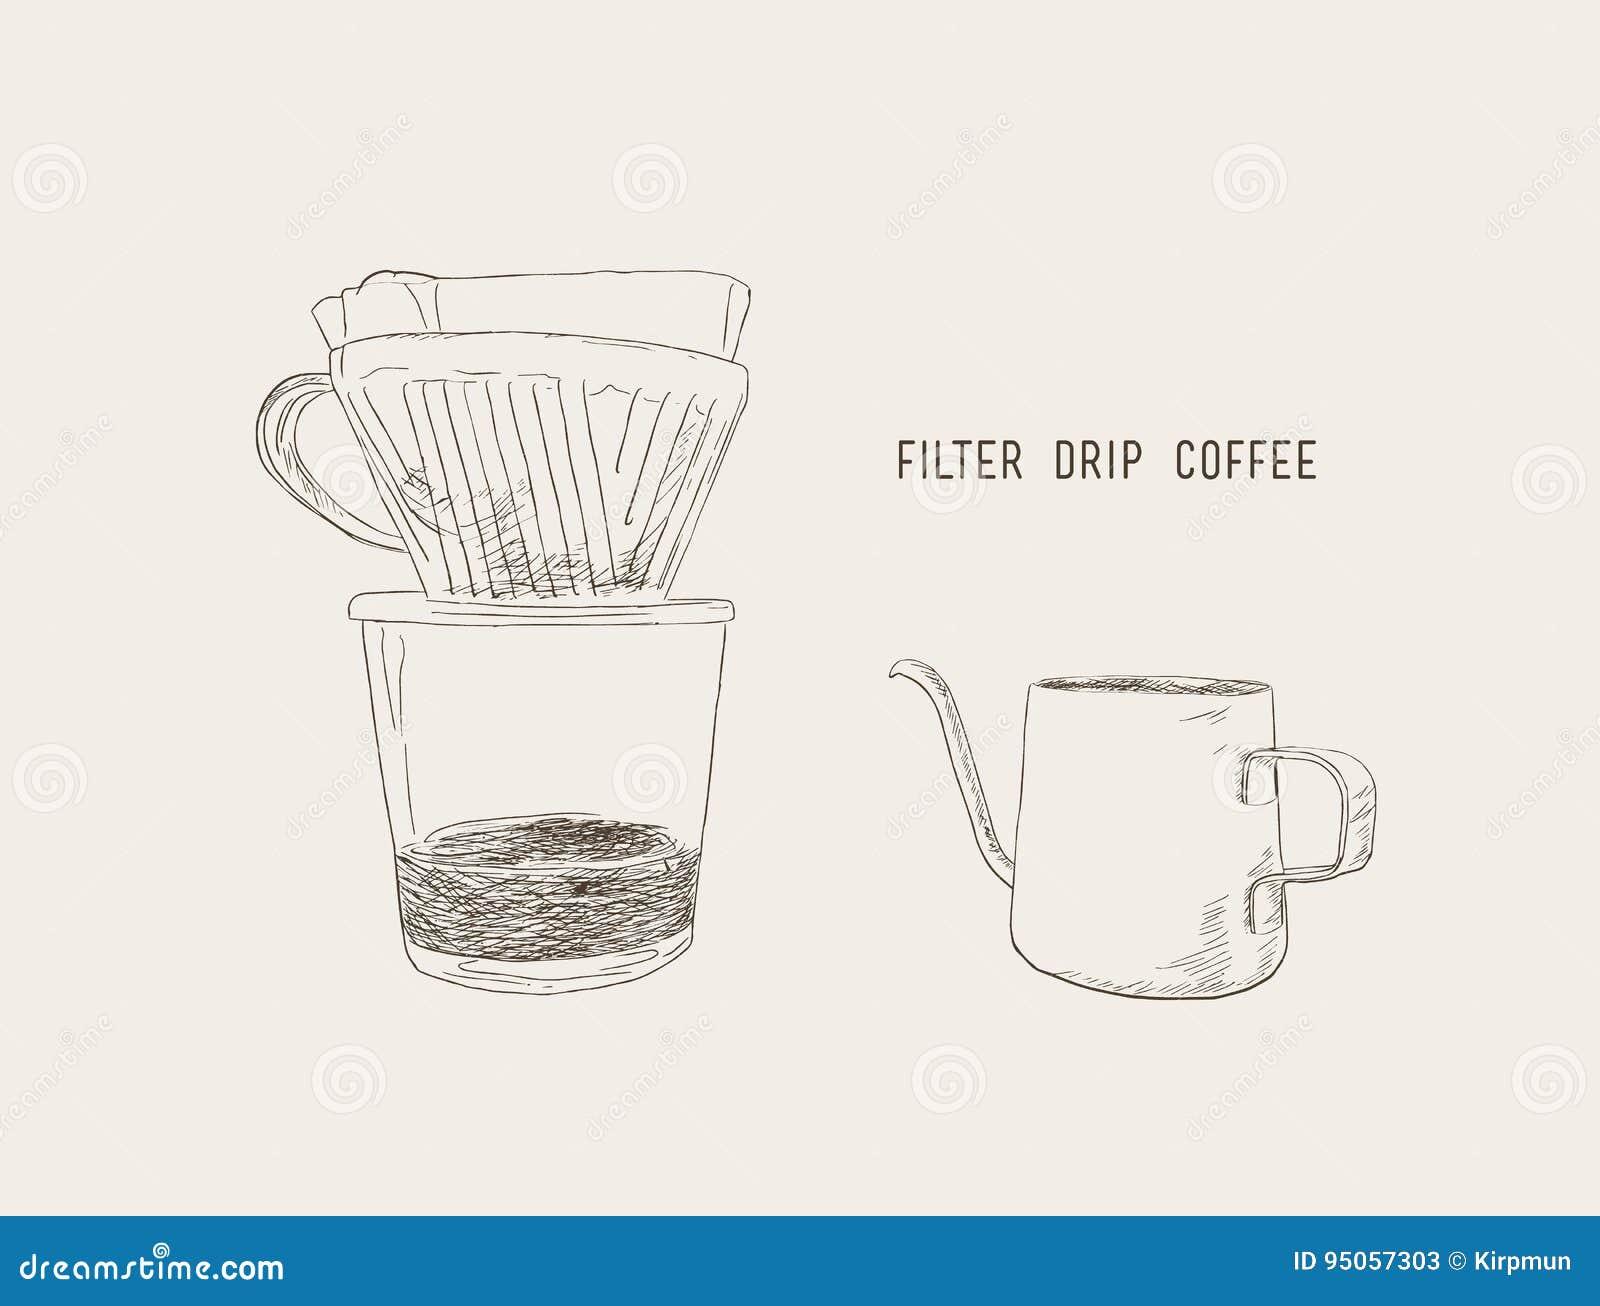 Filter Drip Coffee Sketch Vector Stock